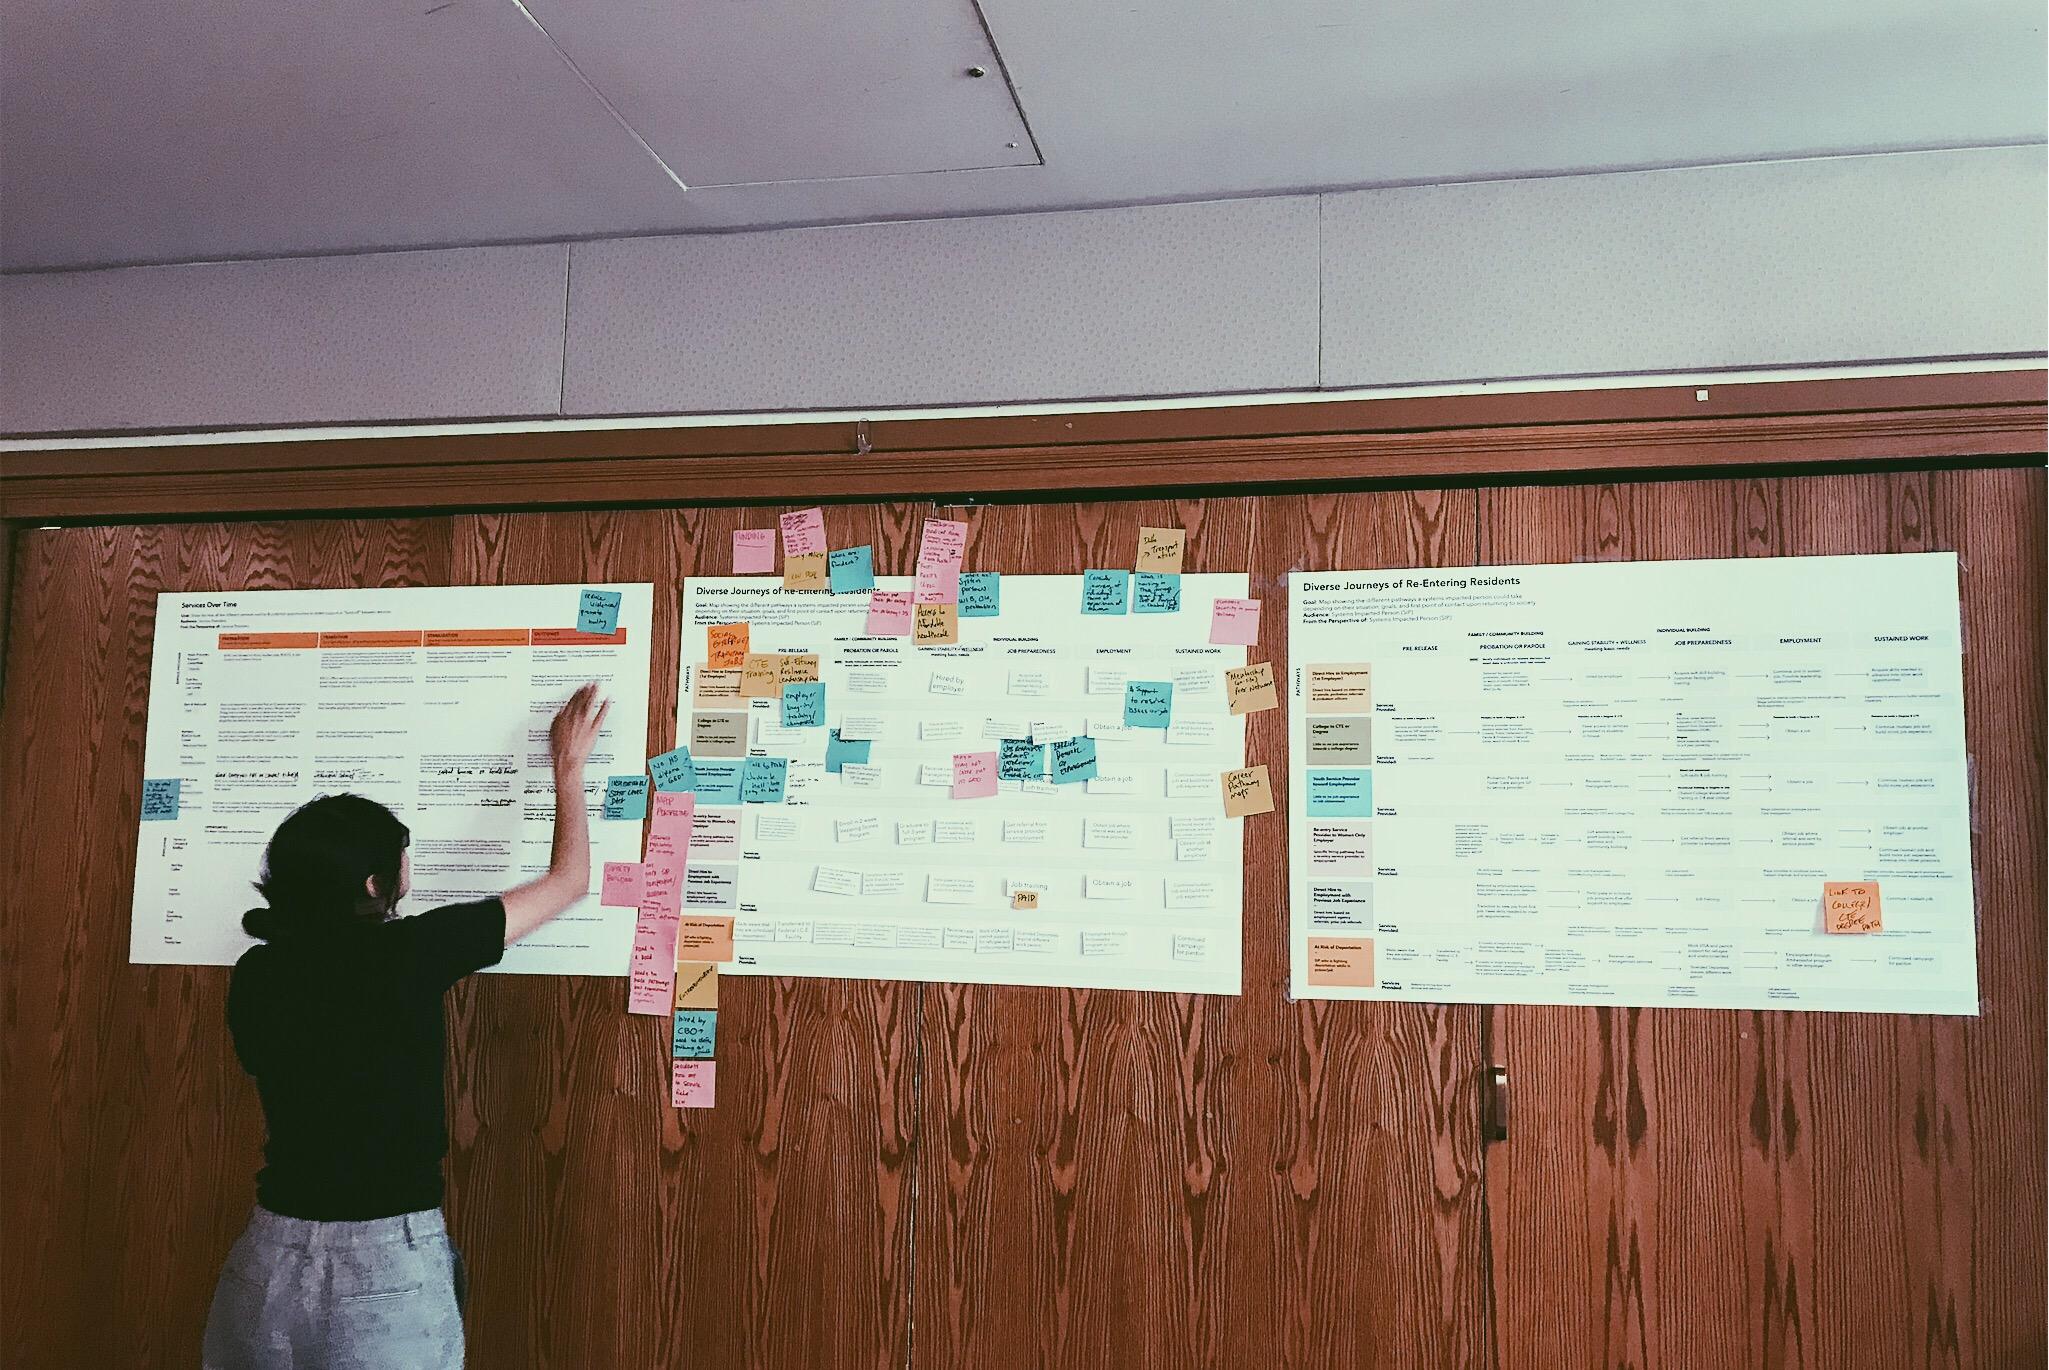 Civic Design Fellow - Service Design FellowshipCivic Design Lab, City of Oakland government